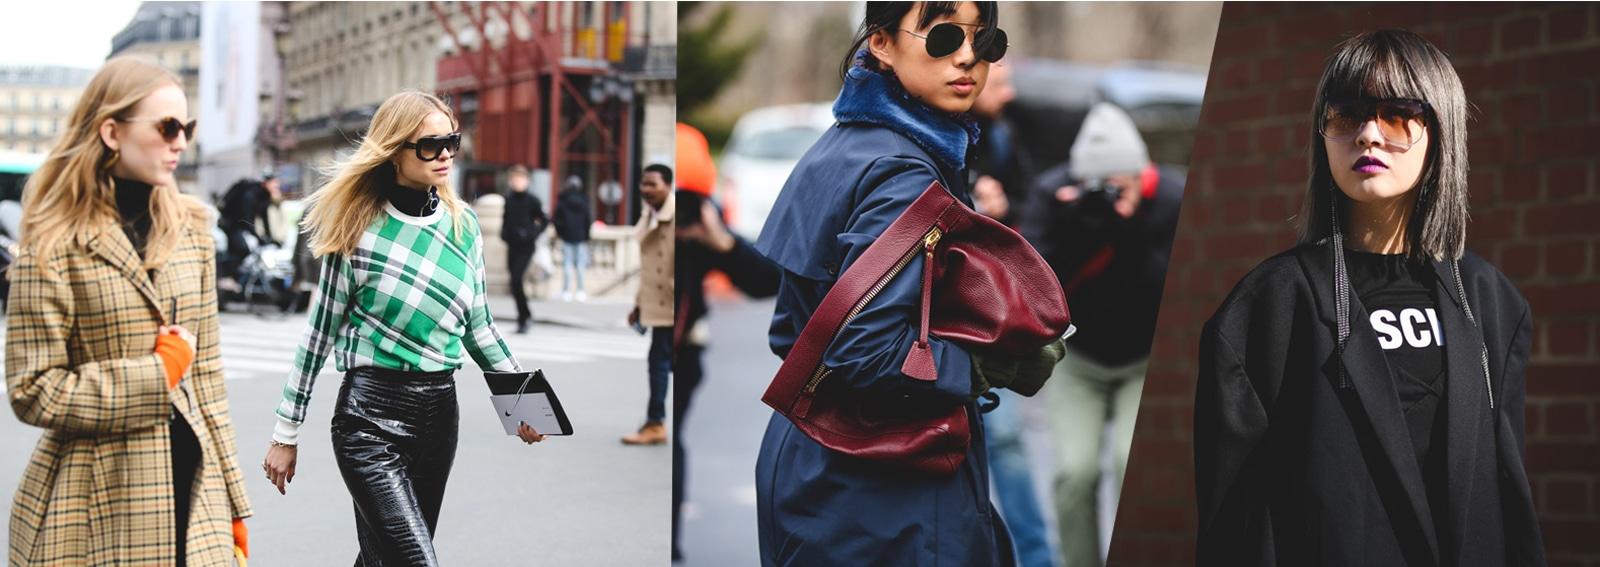 cover-street-style-occhiali-da-sole-desktop